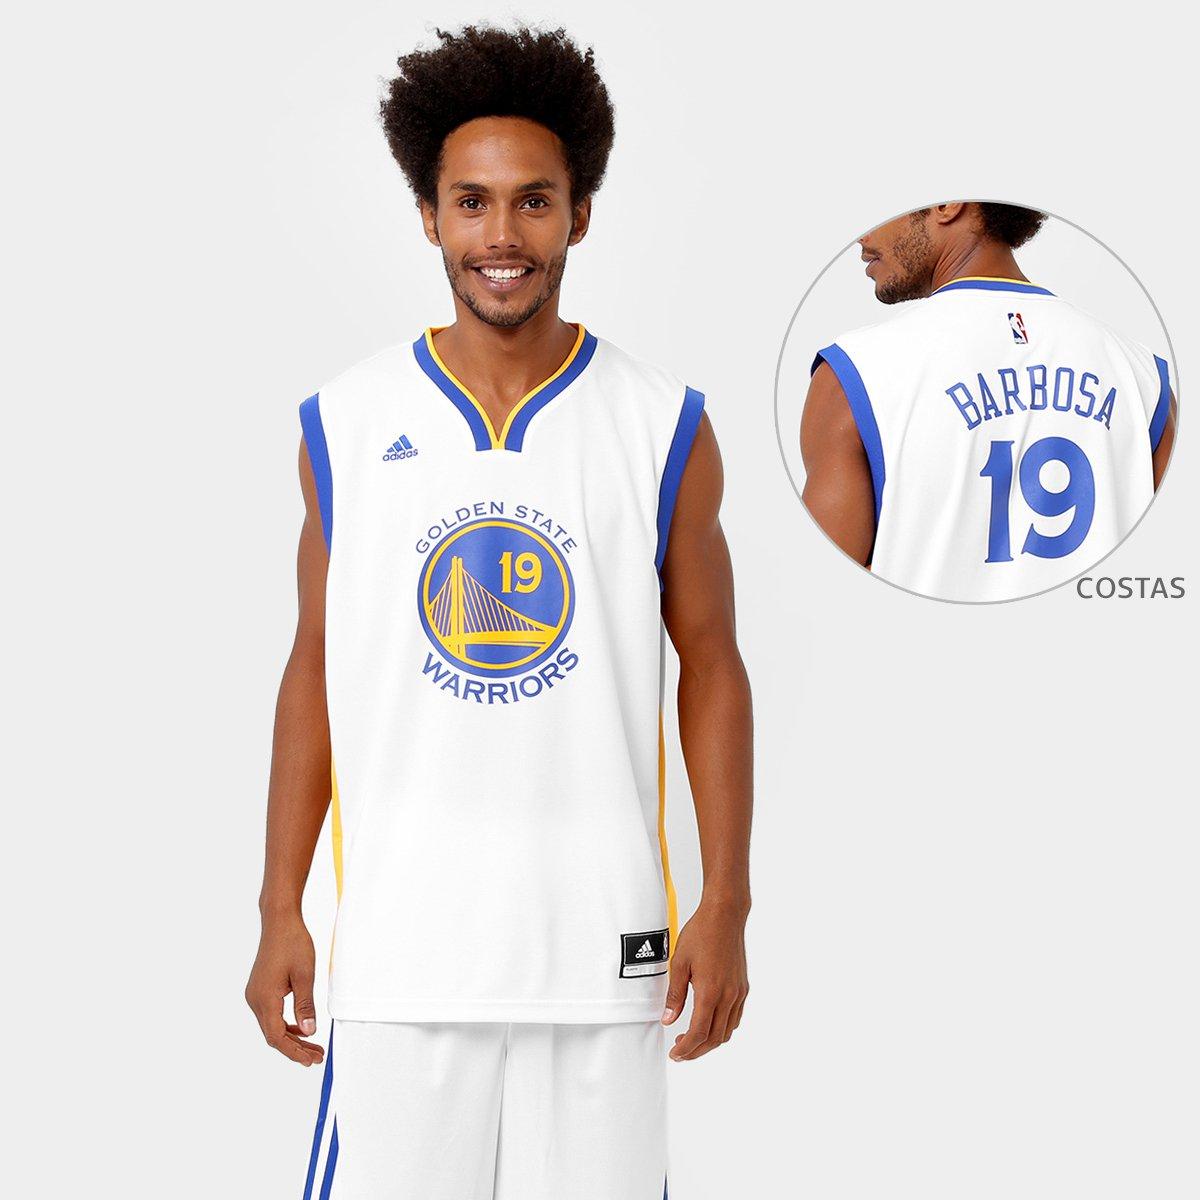 ce9f758b9b Camiseta Regata Adidas NBA Golden State Warriors - Barbosa | Loja NBA